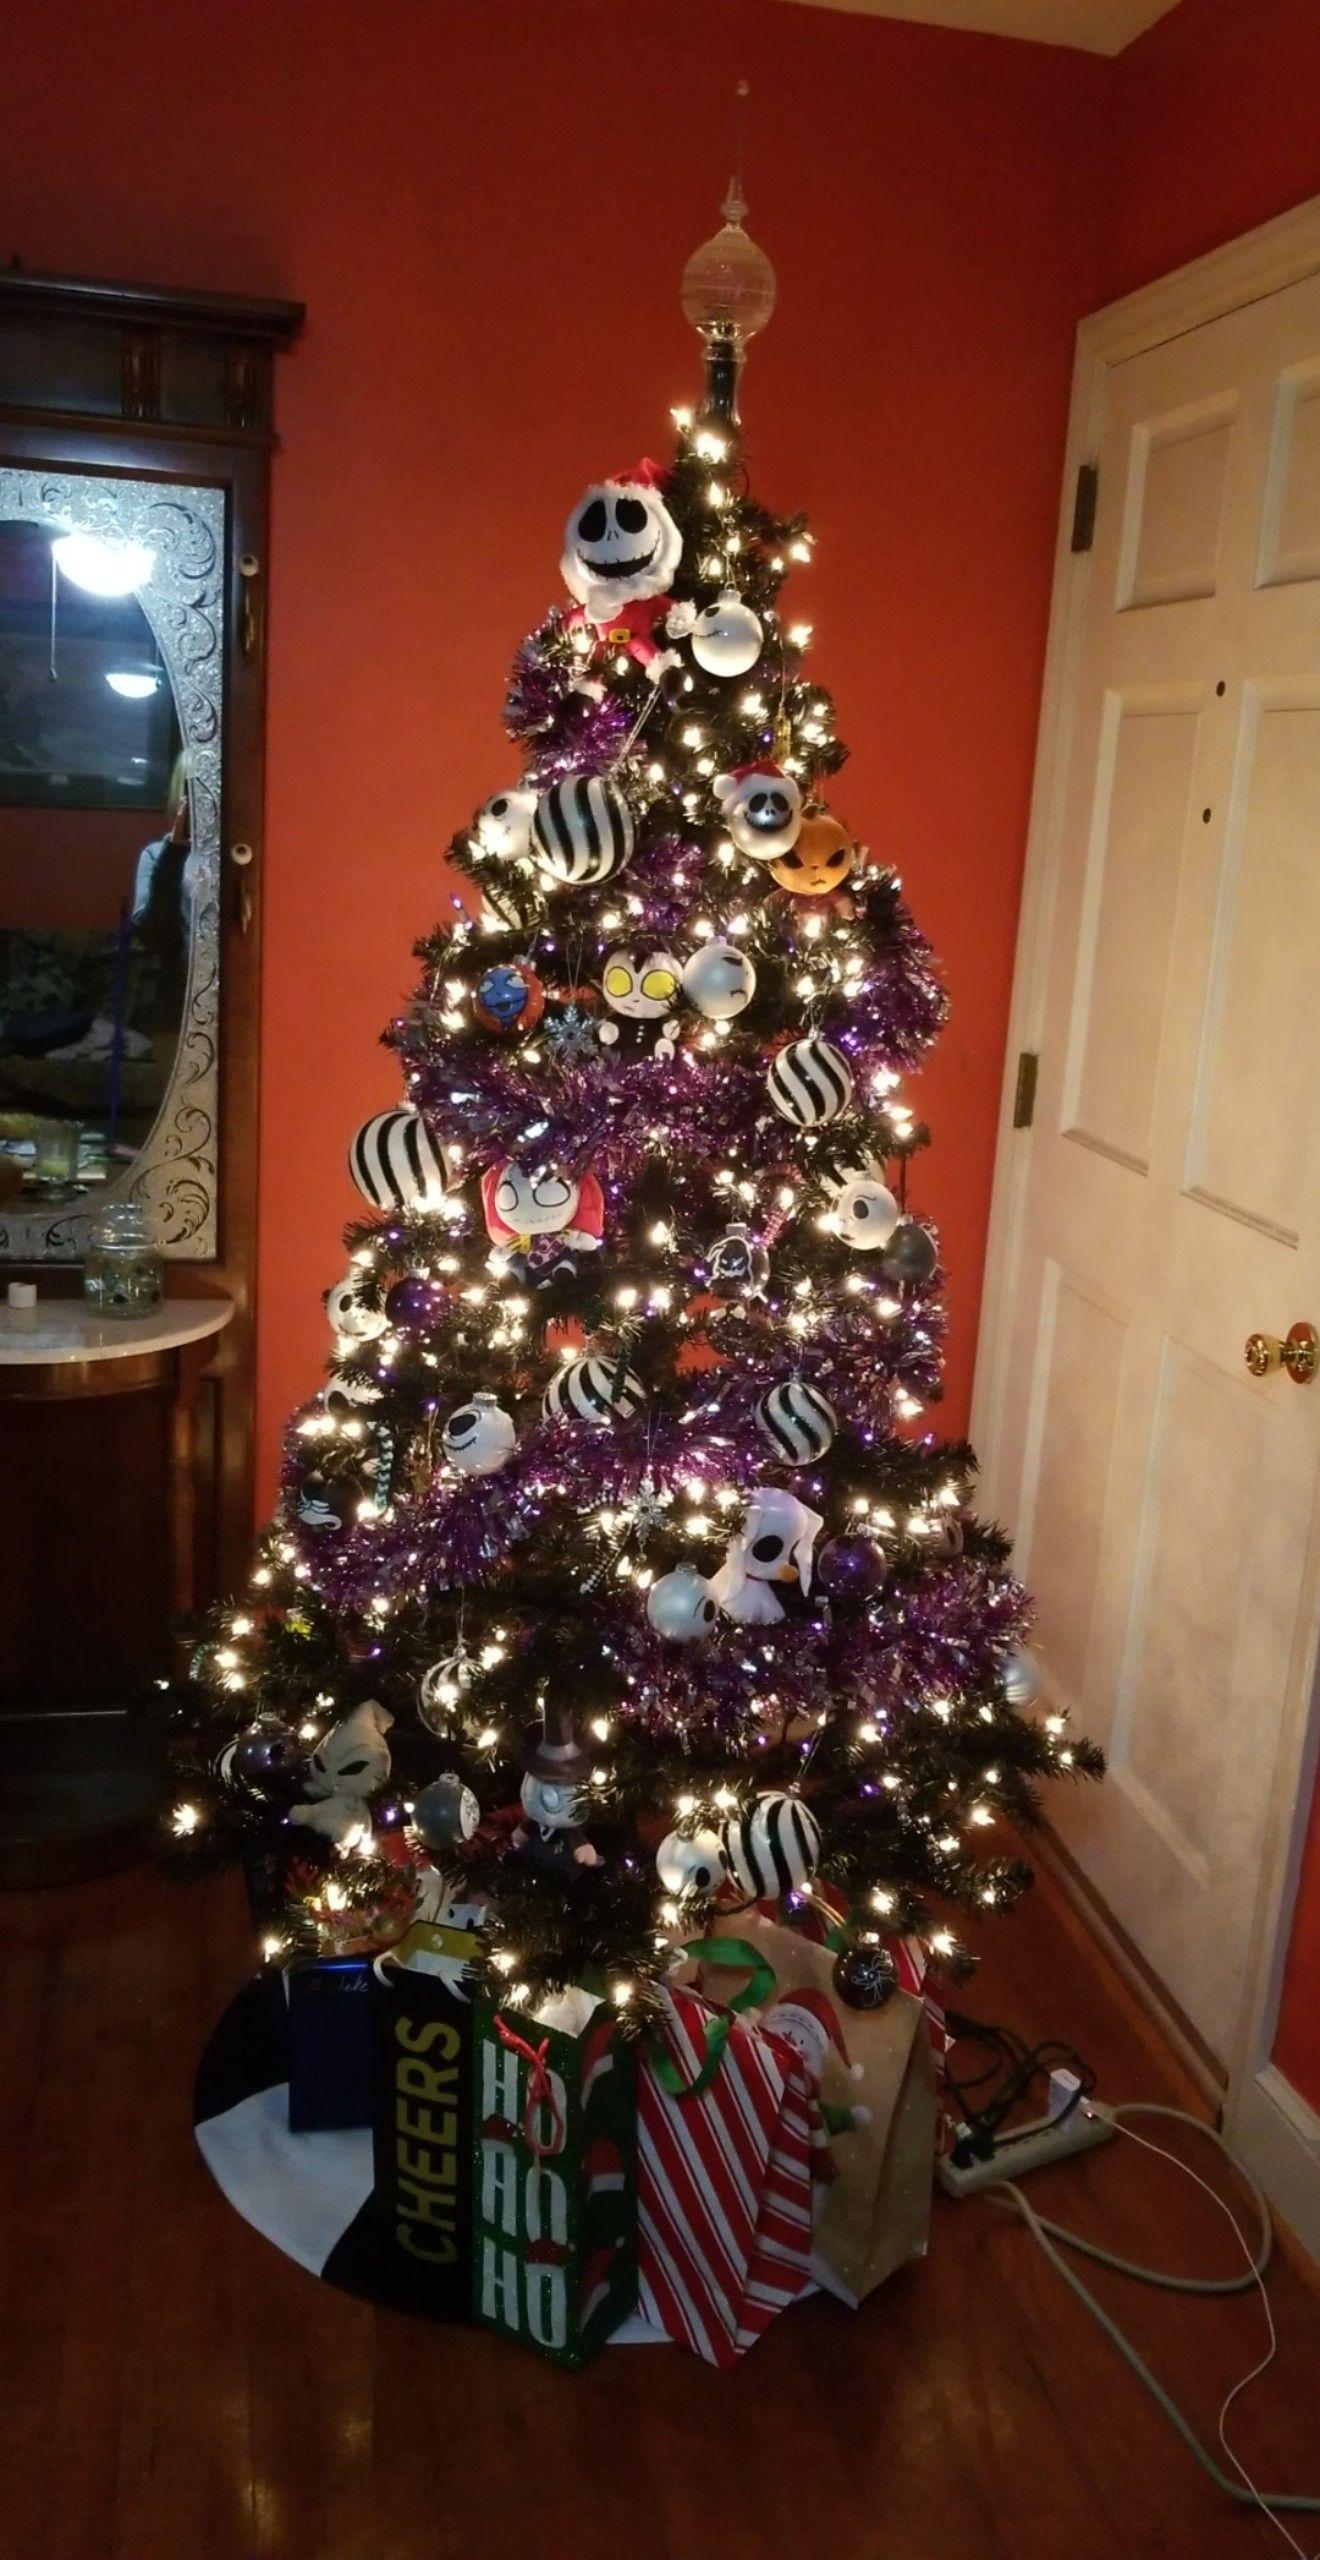 Nightmare Before Christmas Tree Nightmare Before Christmas Wreath Nightmare Before Christmas Decorations Nightmare Before Christmas Ornaments